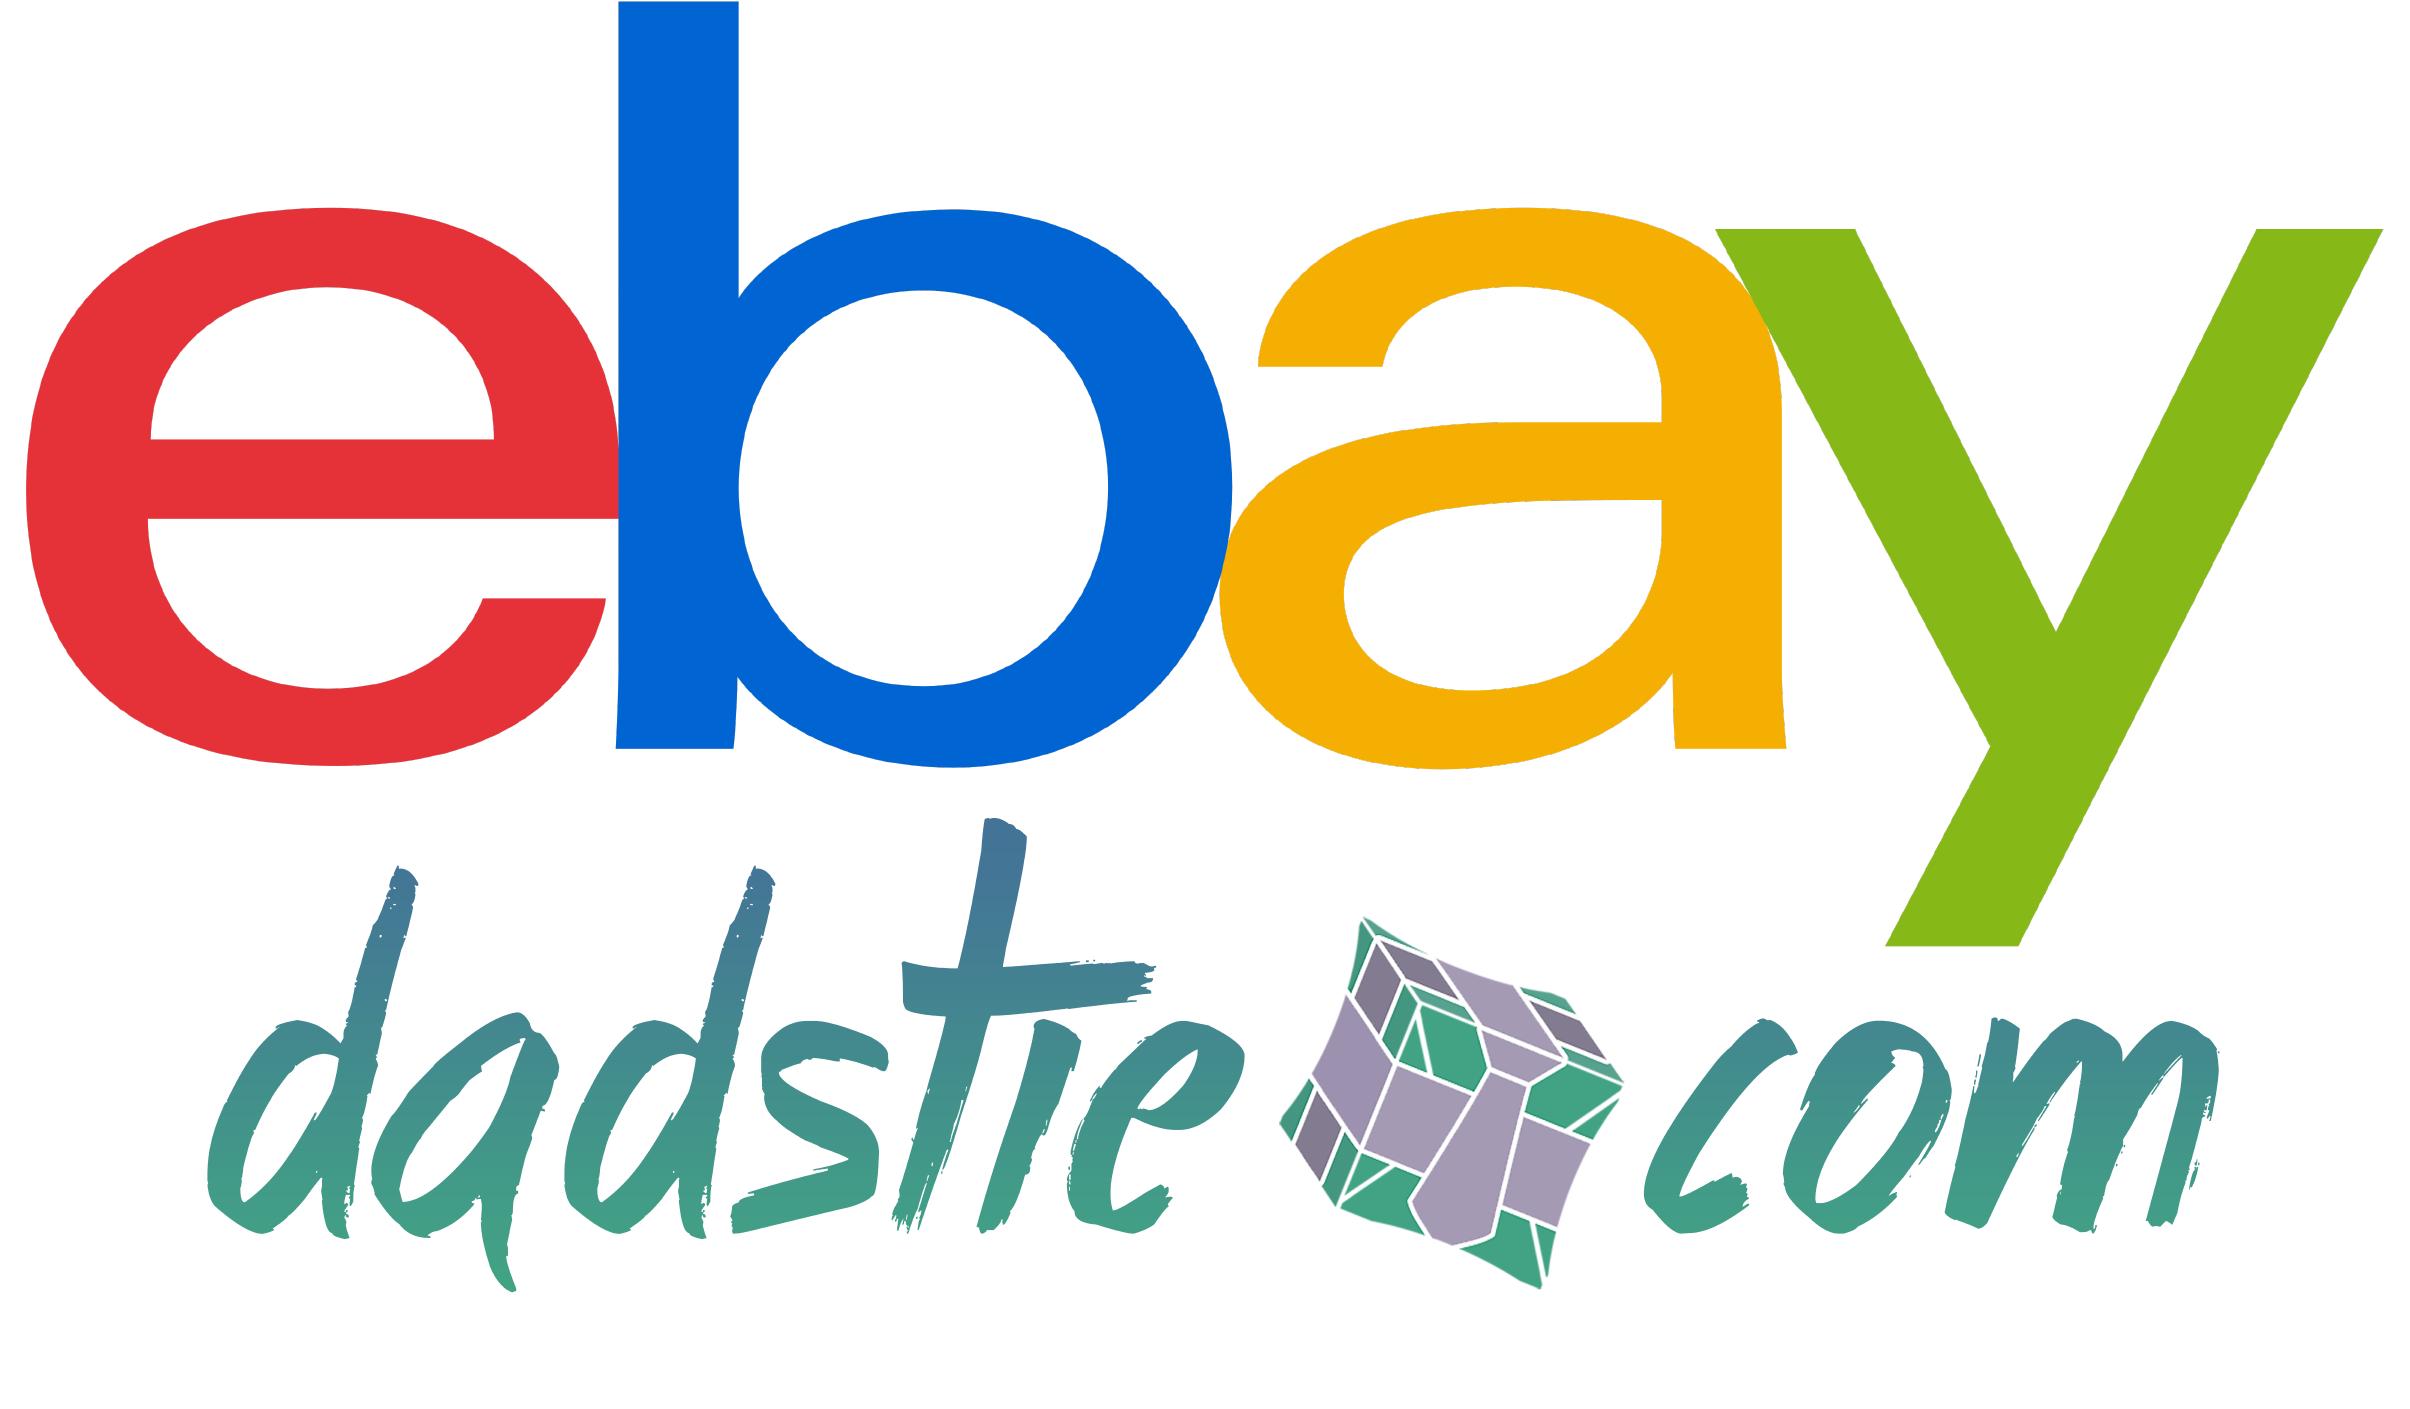 Exclusive eBay Savings